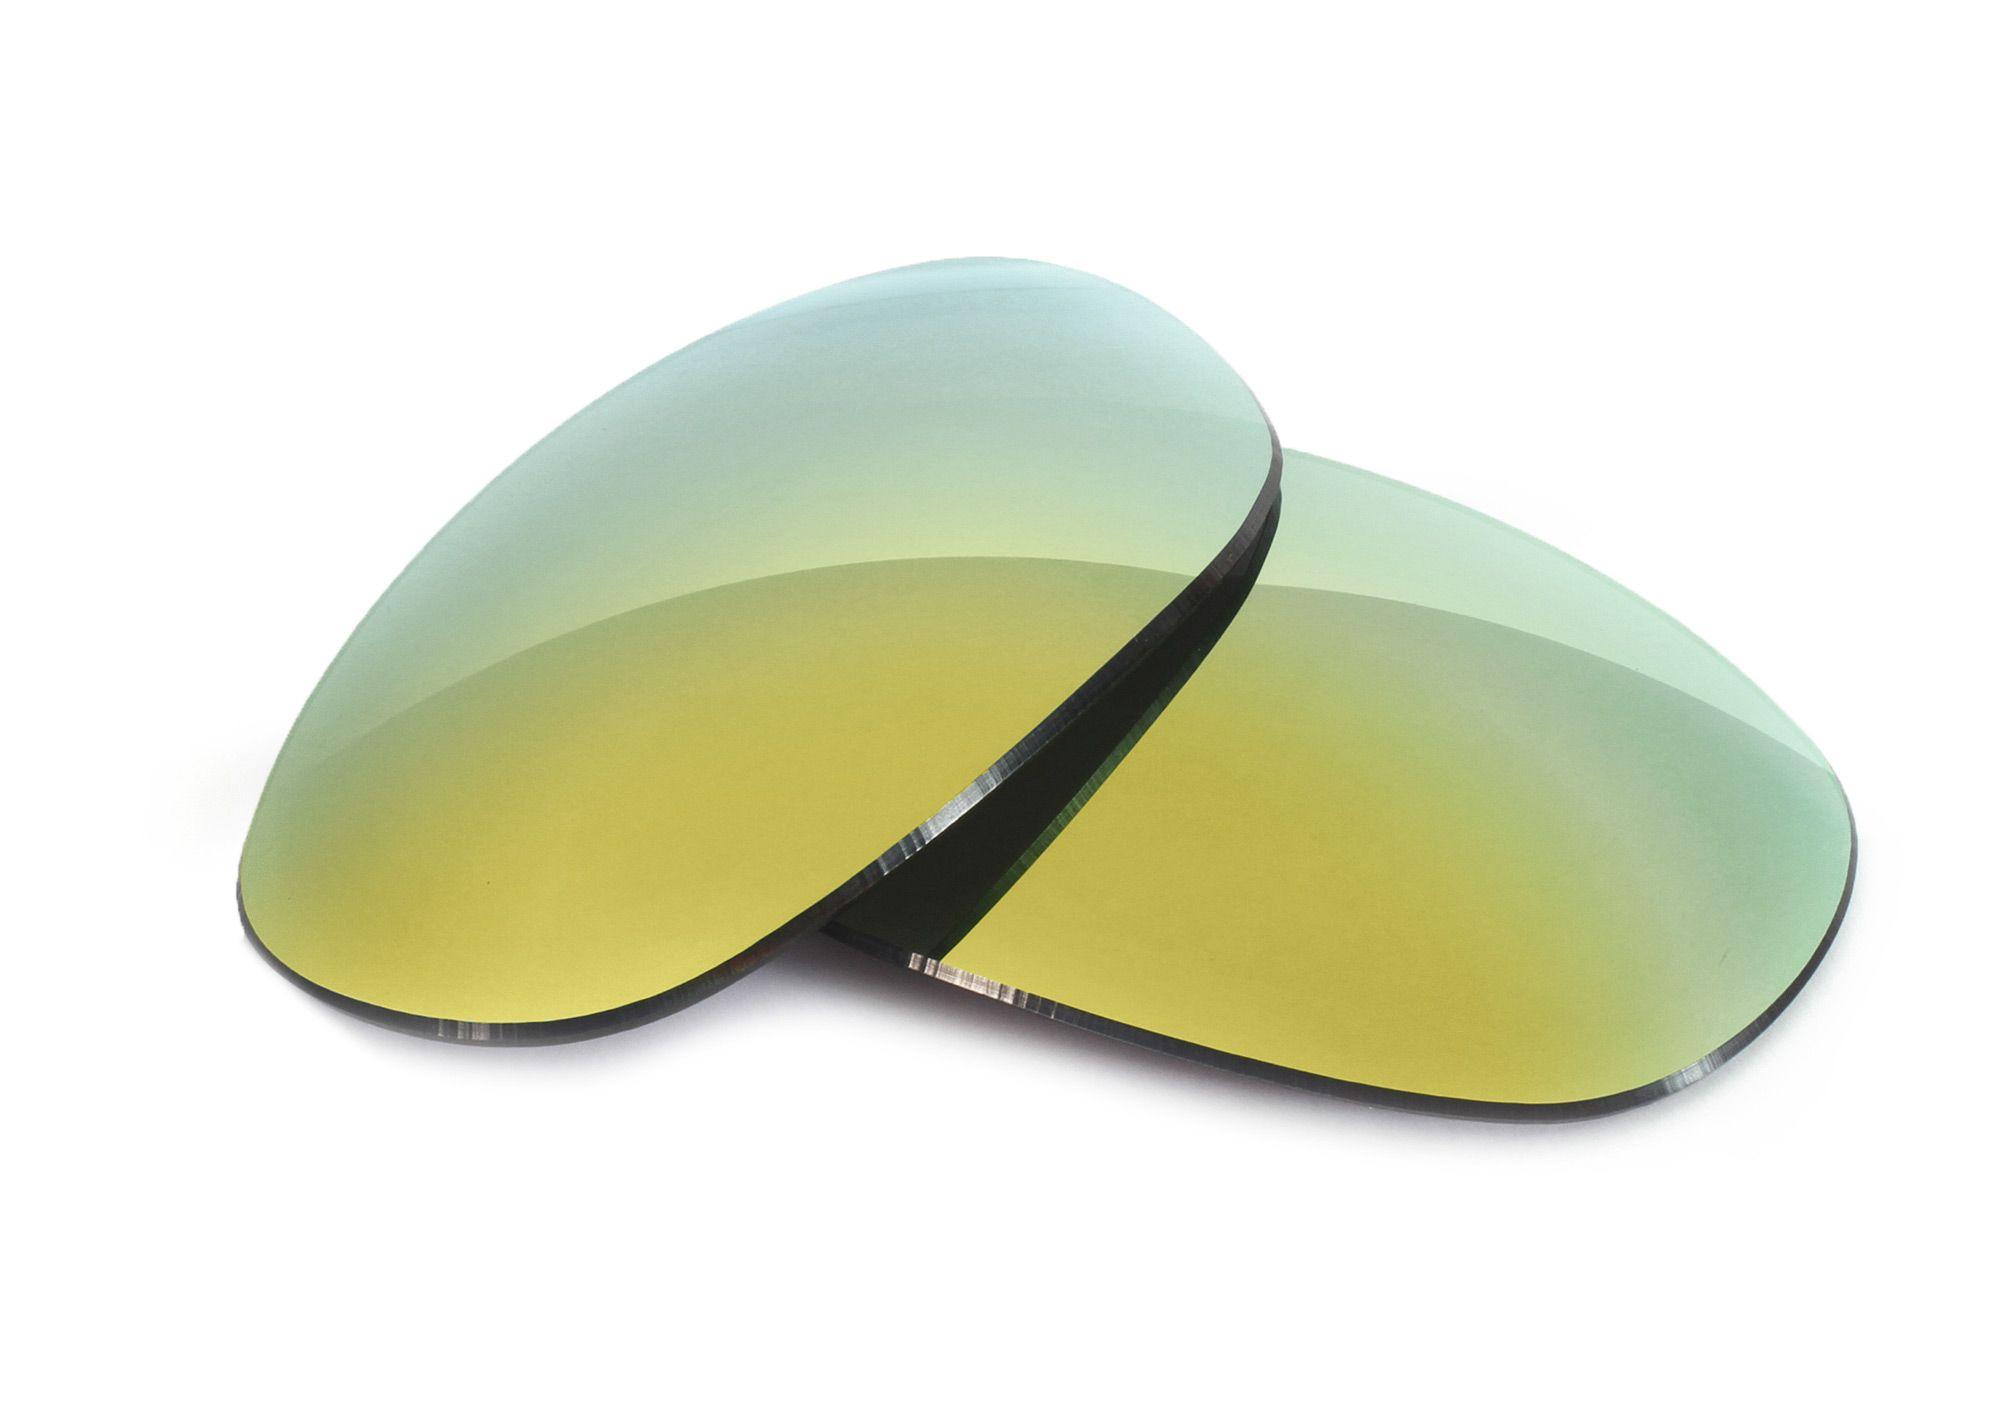 cf00849bd6895 Nike Tarj Classic Evo132 Grey Lens Fusion Mirror Replacement Lenses ...